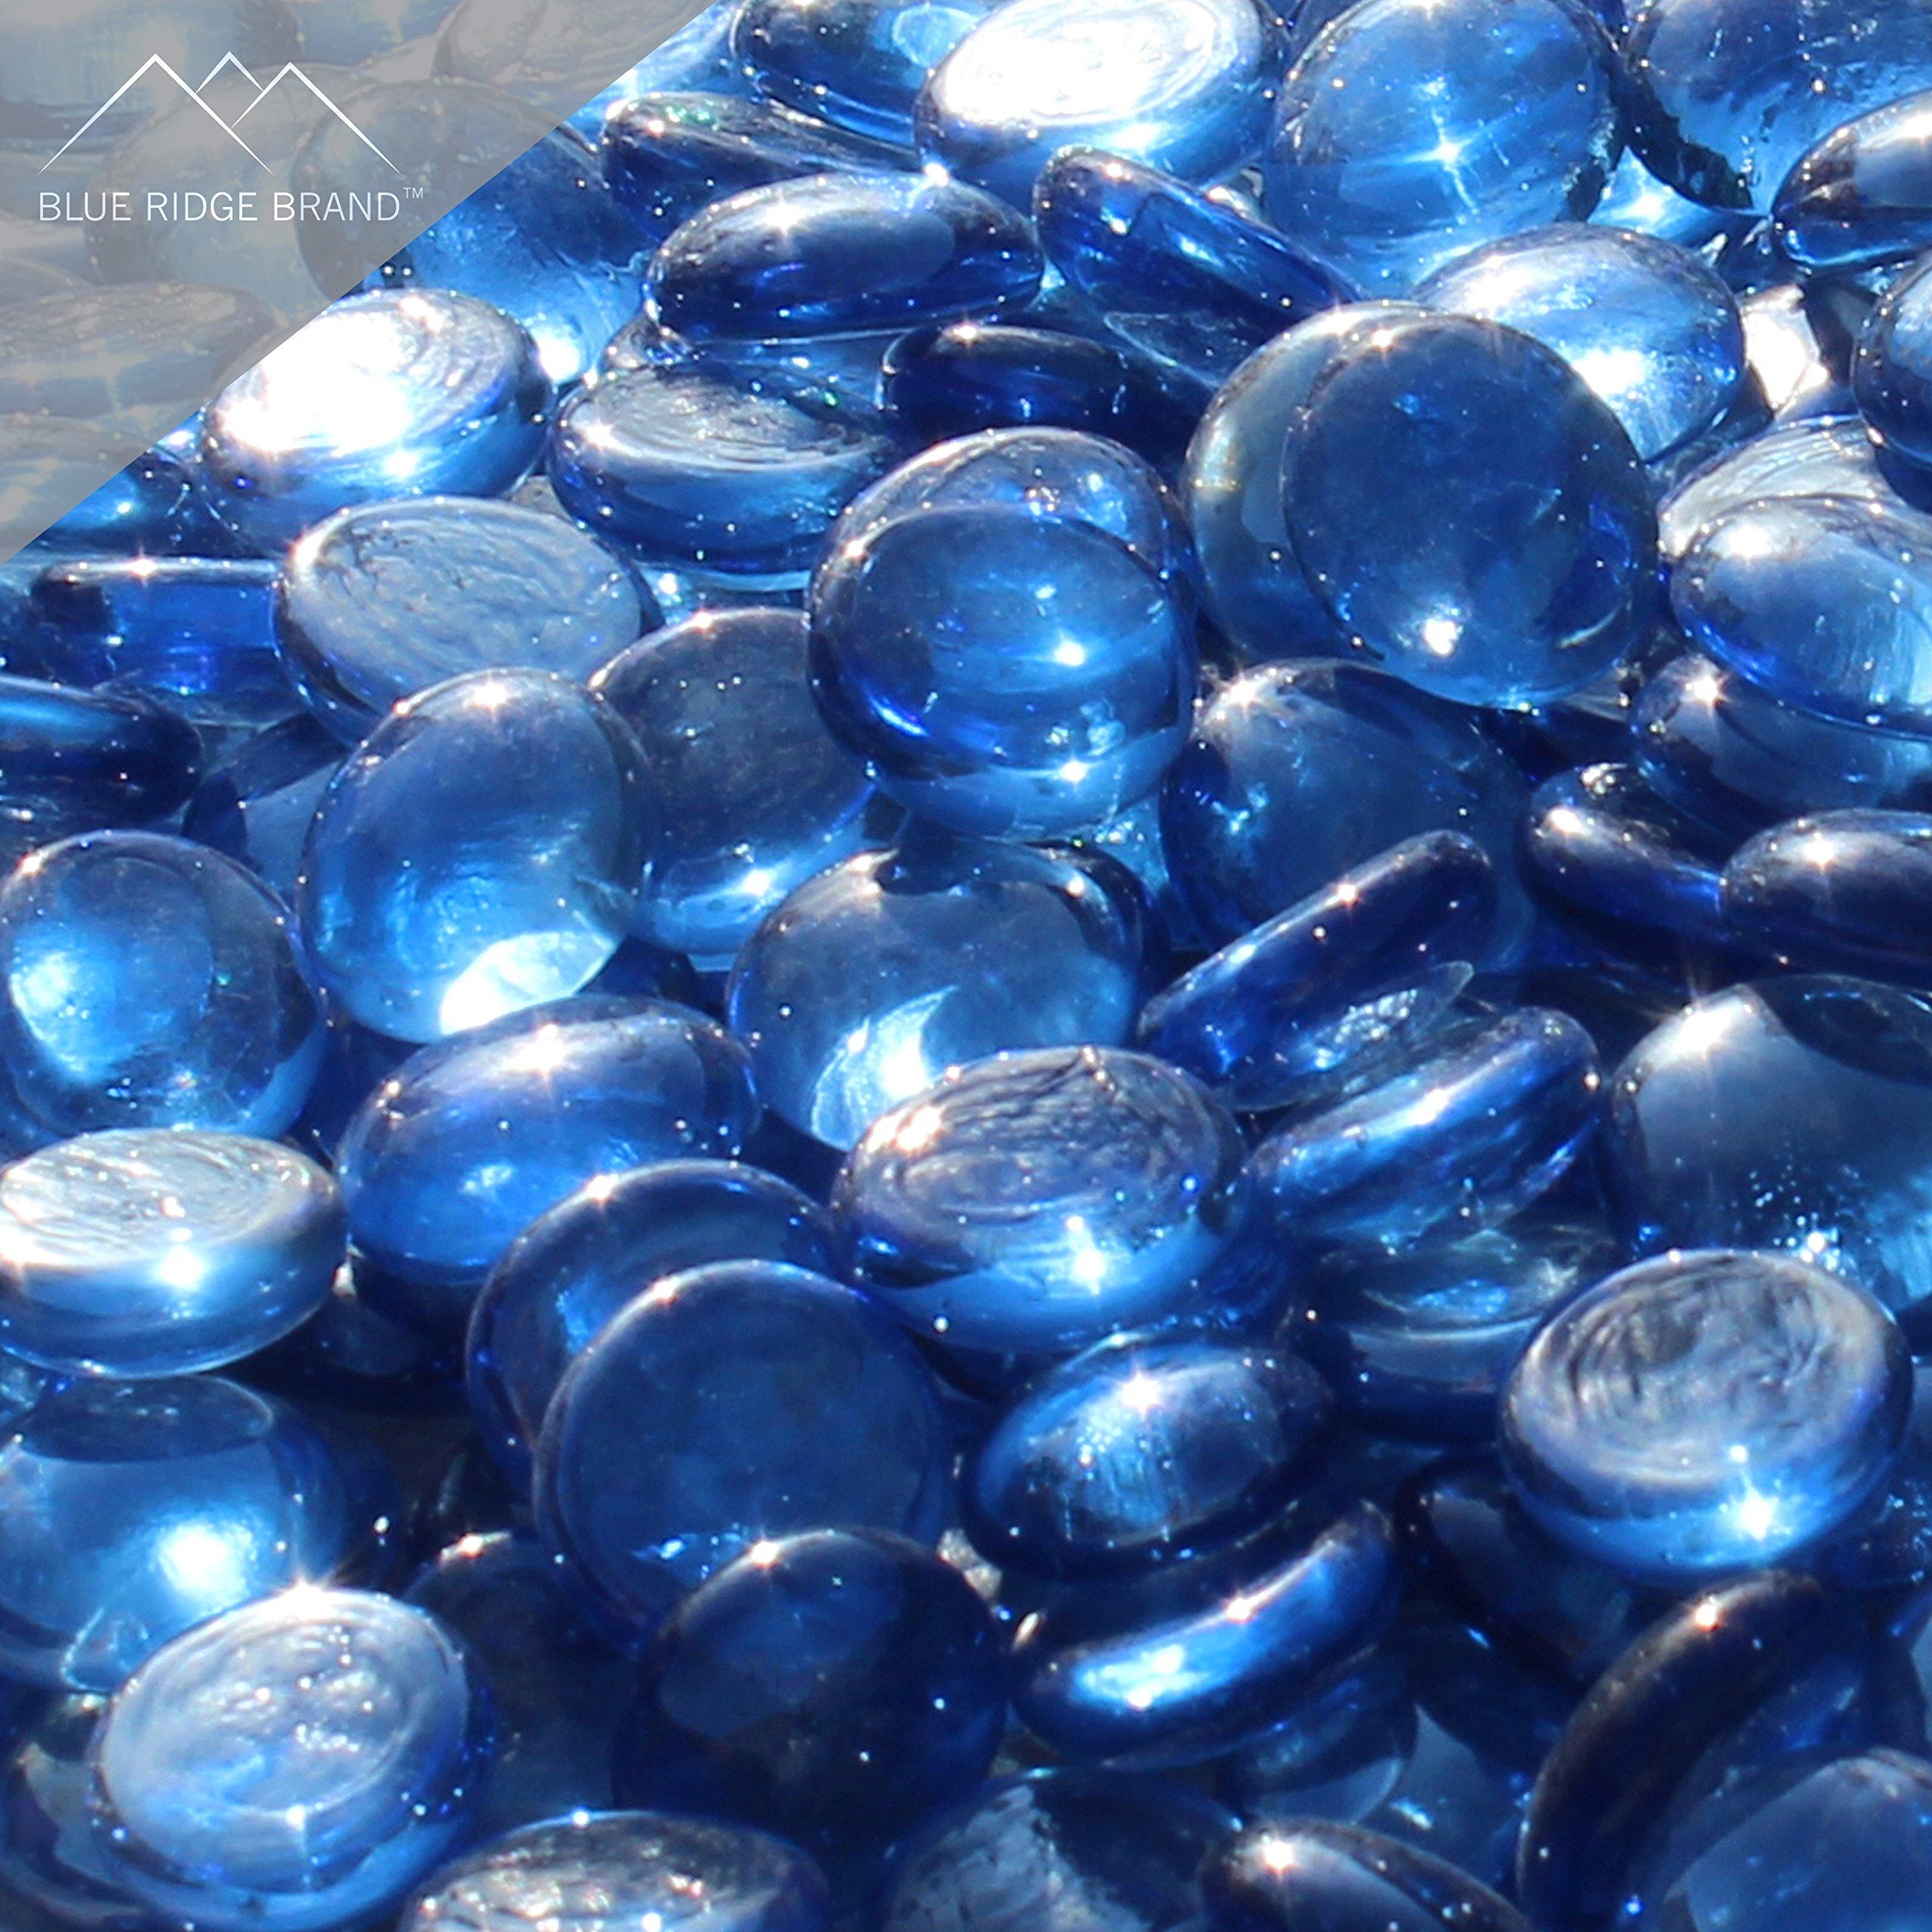 Blue Ridge Brand trade; Light Blue Reflective Fire Glass Beads - 10-Pound Professional Grade Fire Pit Glass - 3/4 Reflective Glass for Fire Pit and Landscaping